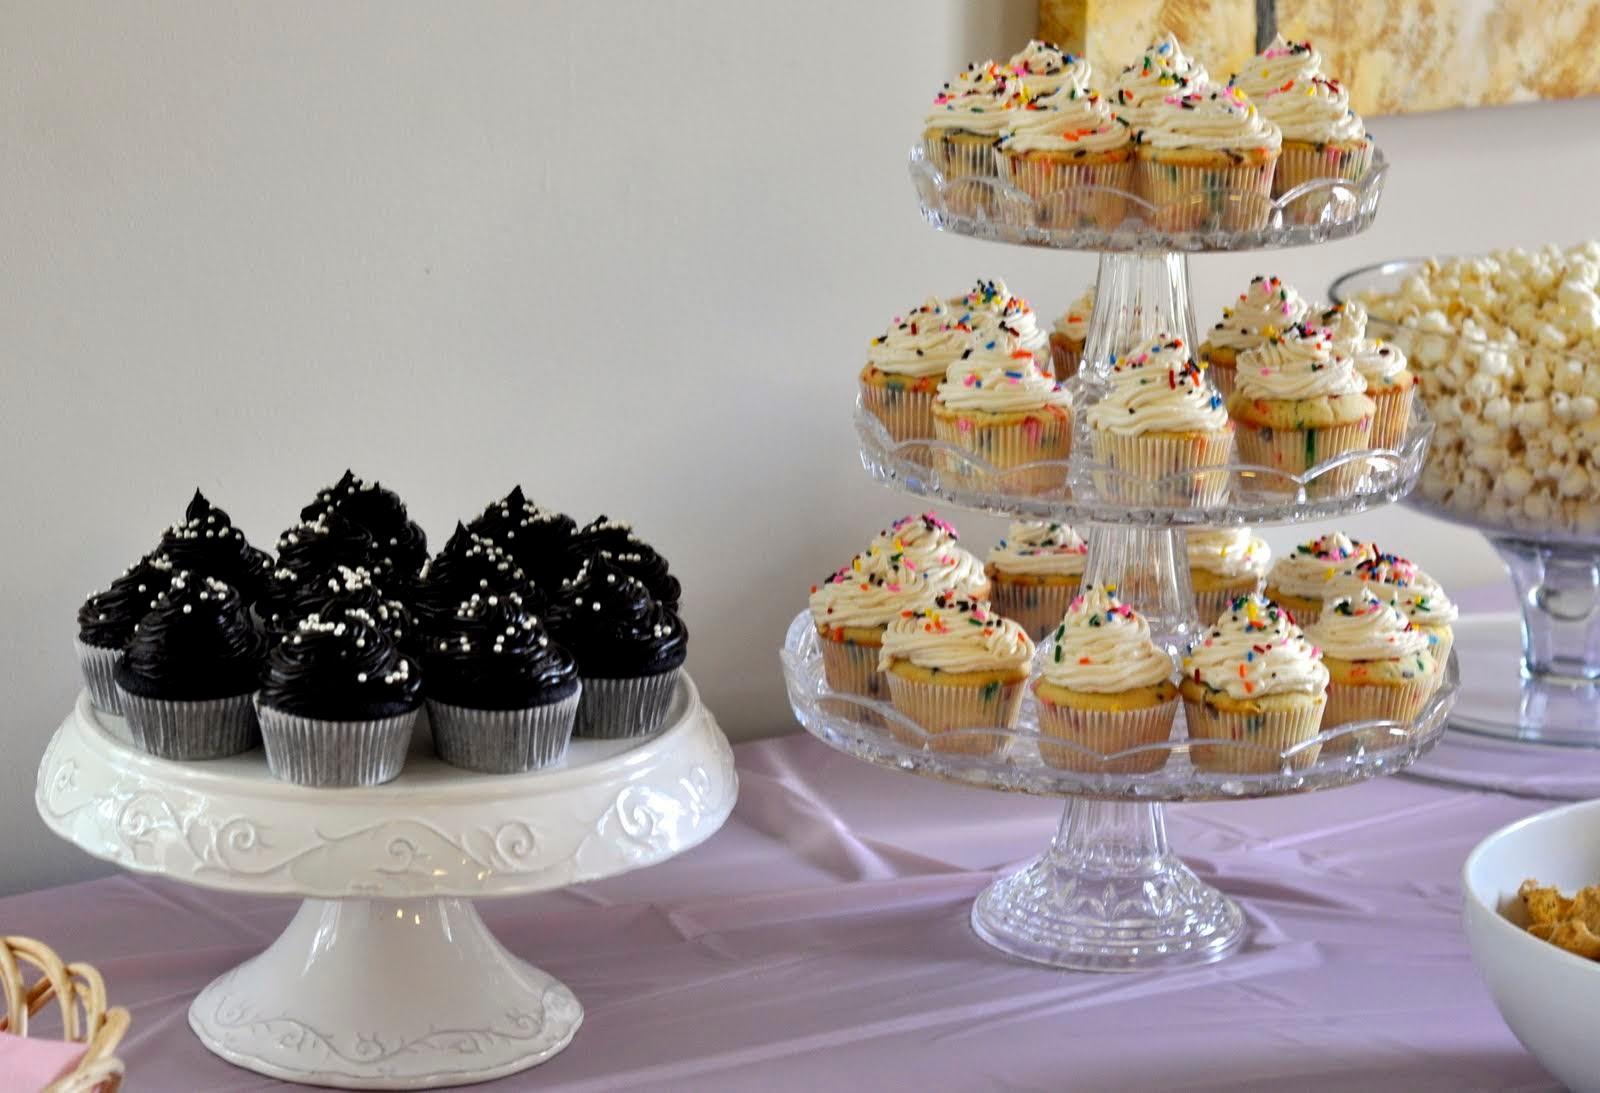 Cupcakes-for-First-Birthday-tasteasyougo.com